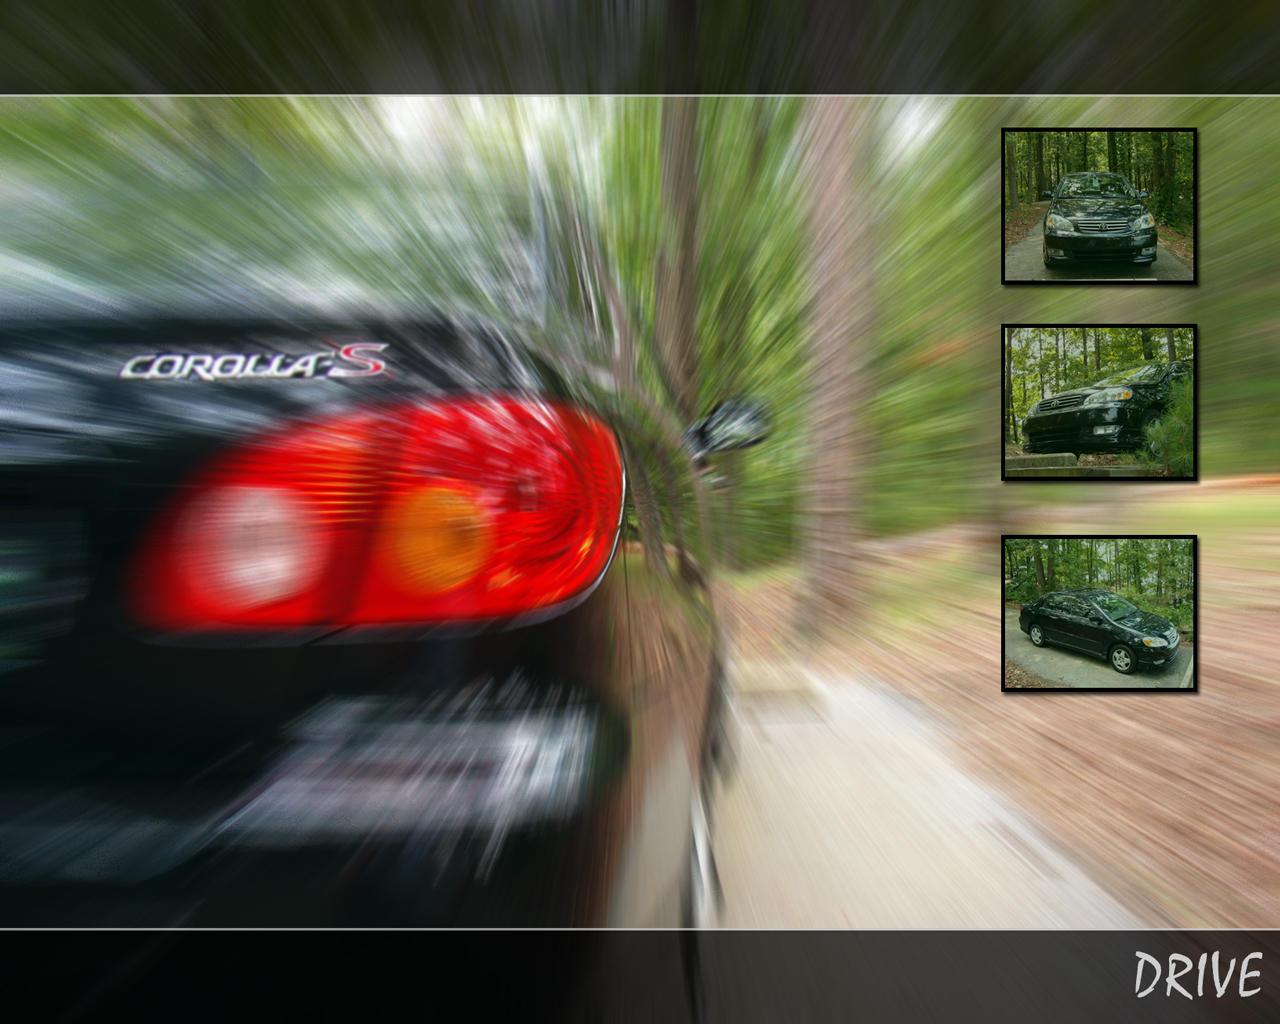 Toyota Corolla 03 by pdelgado